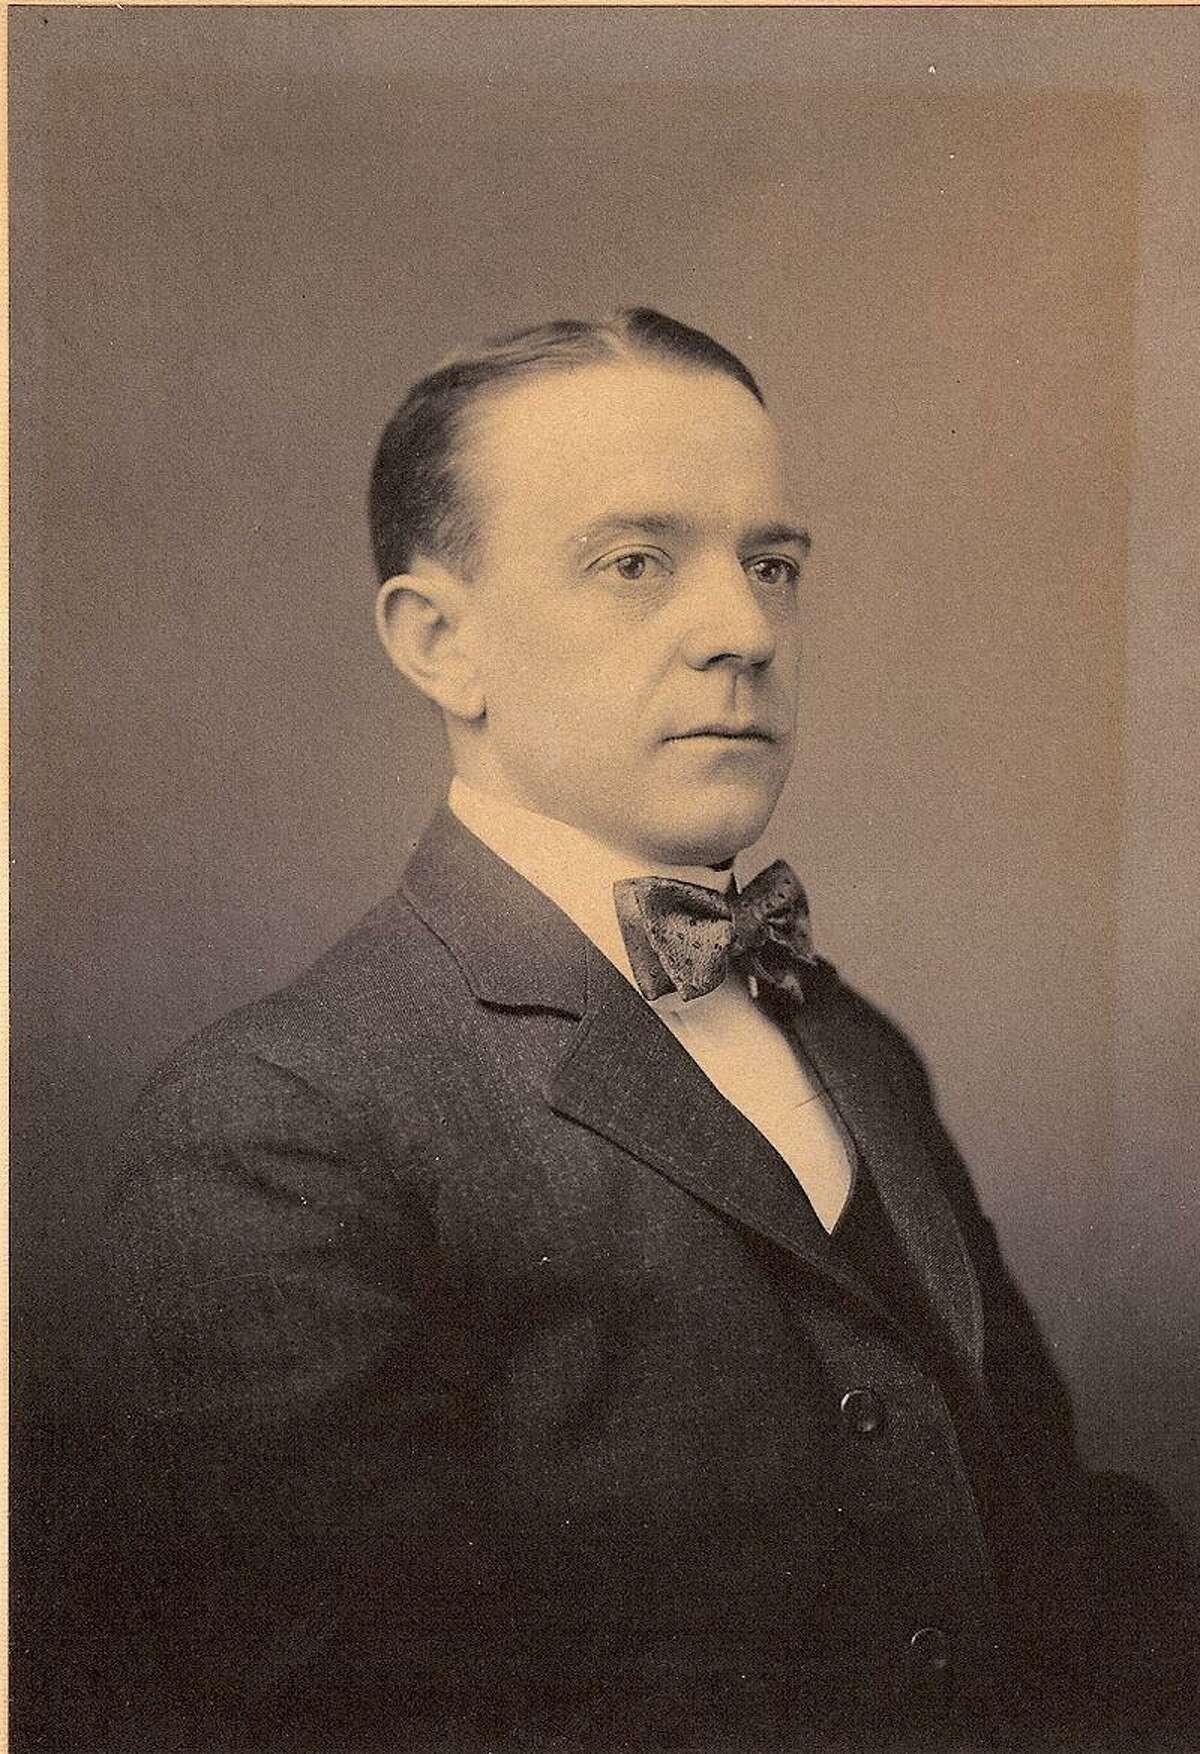 Sanford W. Smith of Chatham in 1896